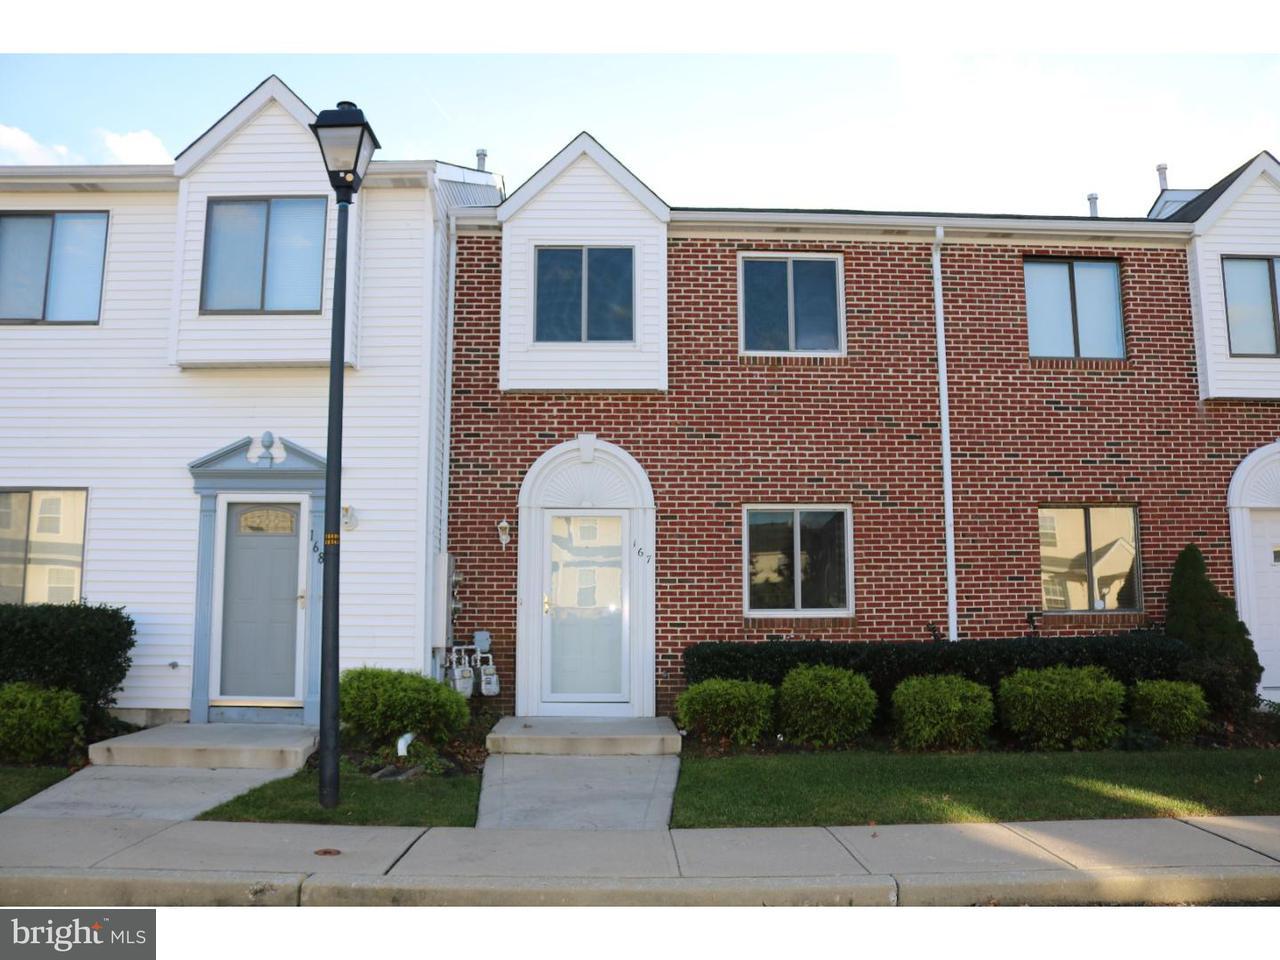 Townhouse for Rent at 167 YORKTOWN BLVD Hammonton, New Jersey 08037 United States